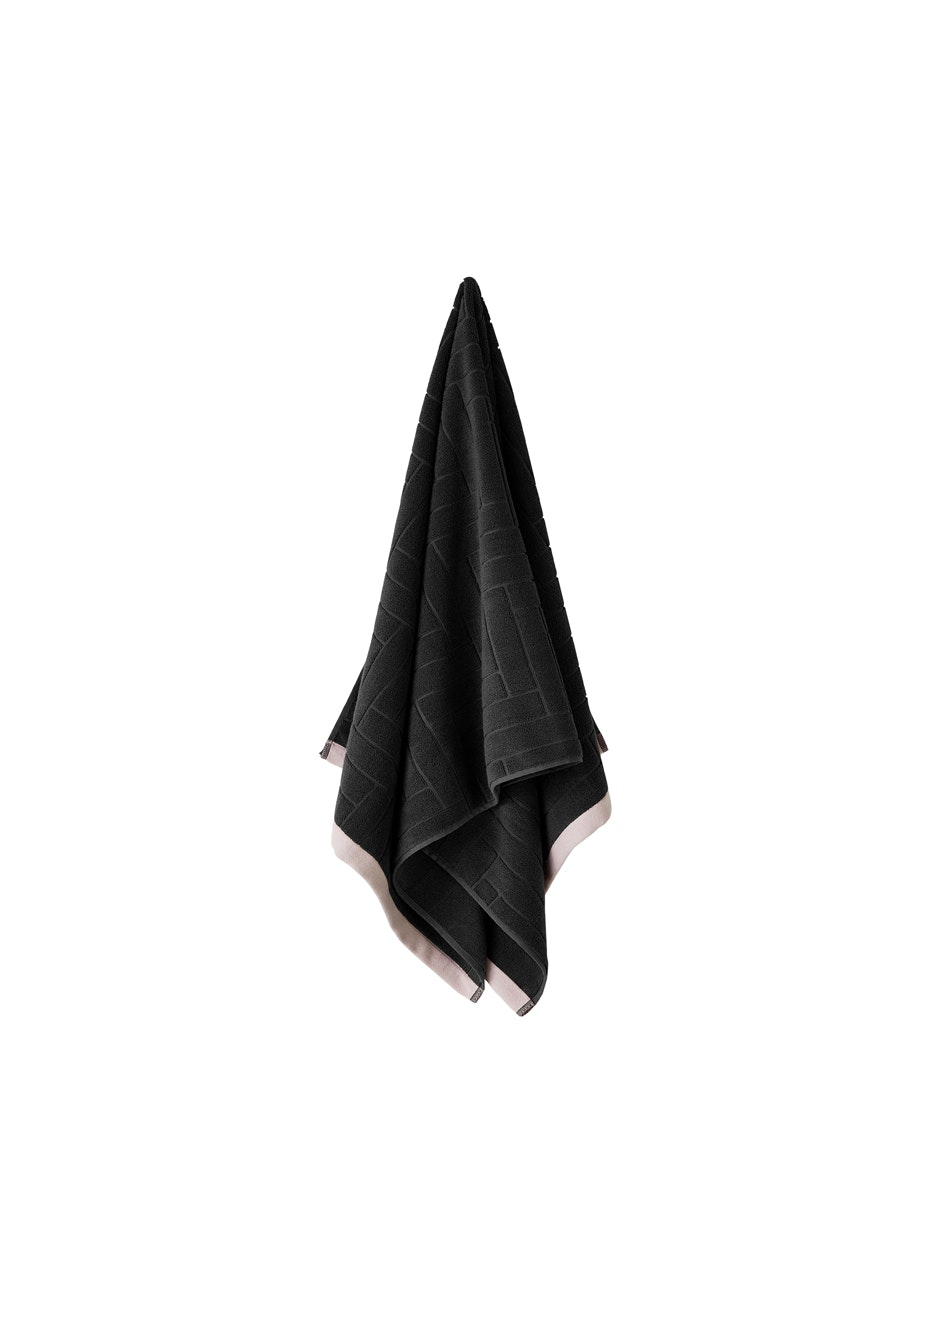 Aura Parquet Bath Towel 700 X 1400Mm Charcoal